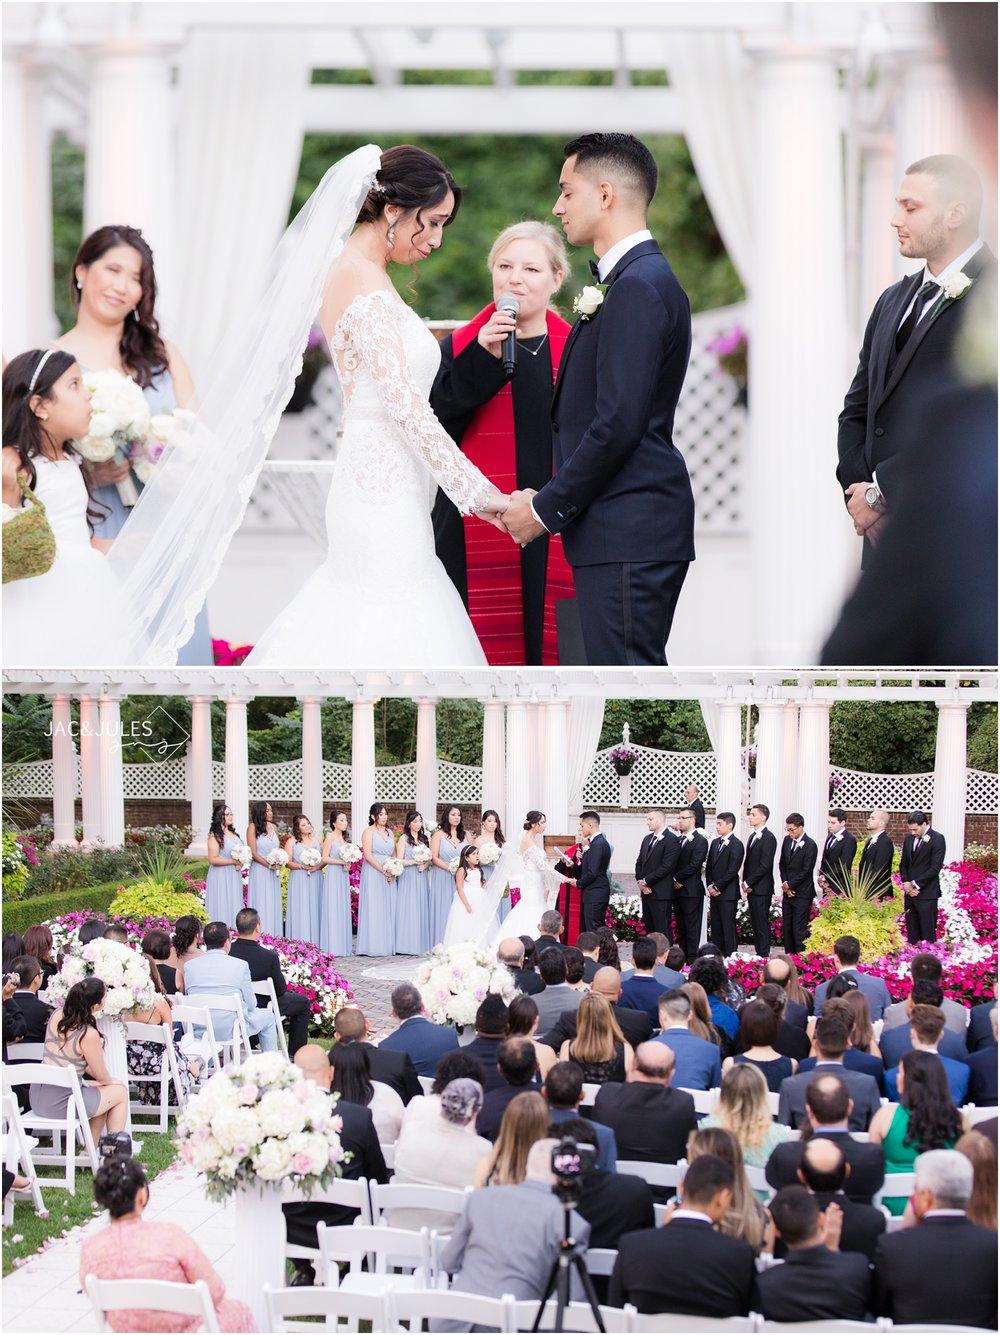 Garden wedding ceremony at The Shadowbrook in Shrewsbury, NJ.